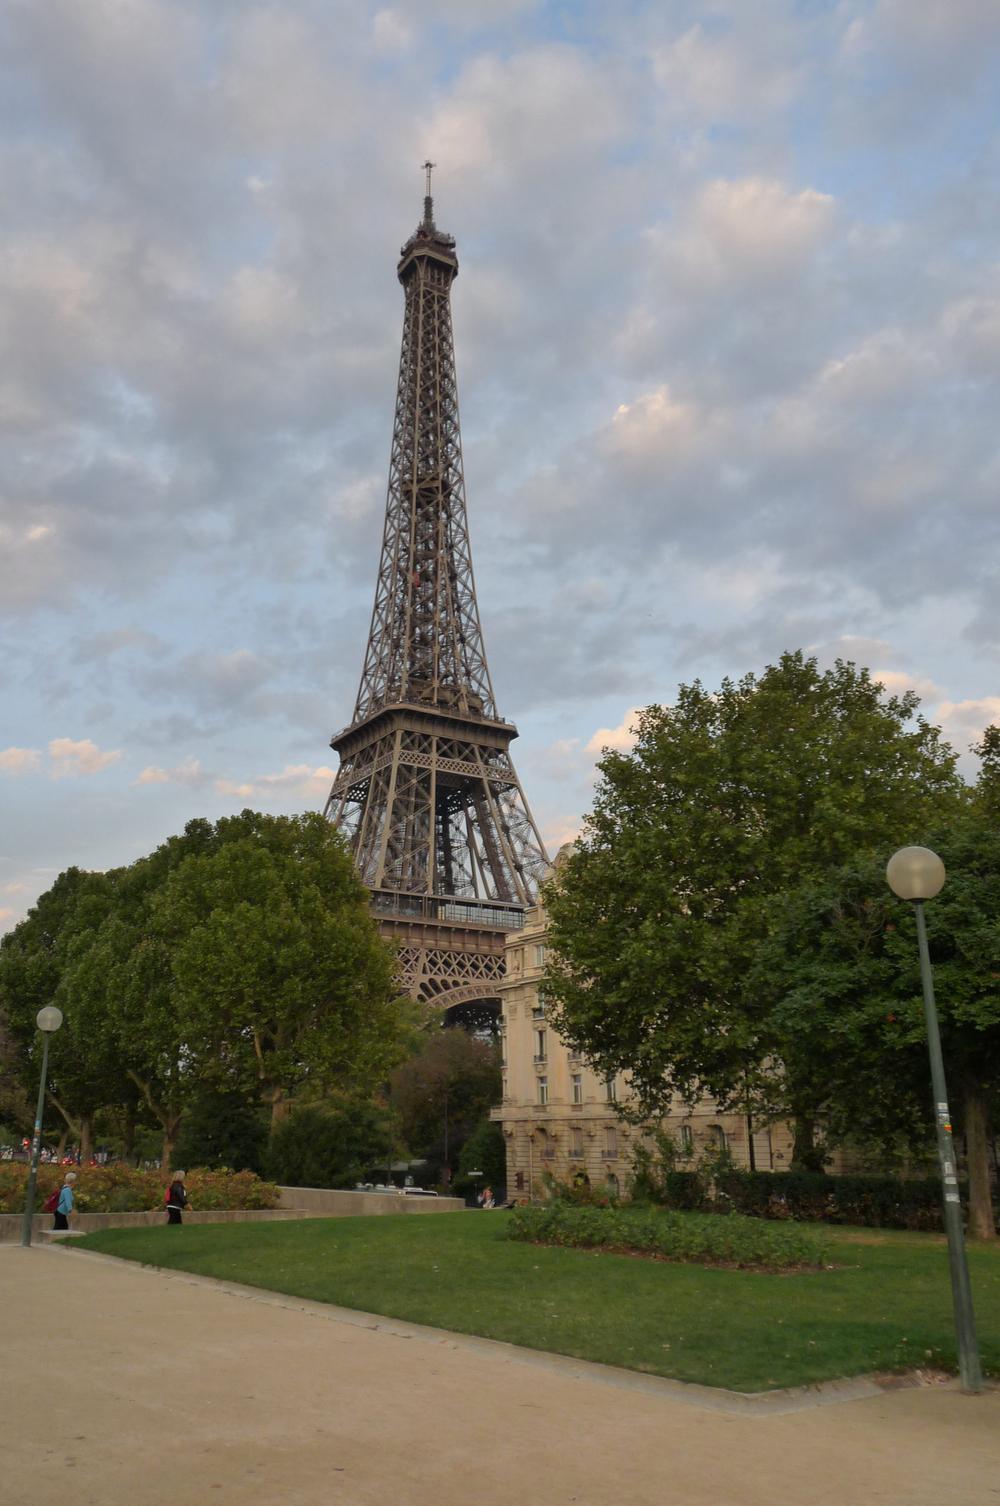 Is_a_Destination_Wedding_in_Your_Future_Paris_France_Eiffel_Tower.jpg